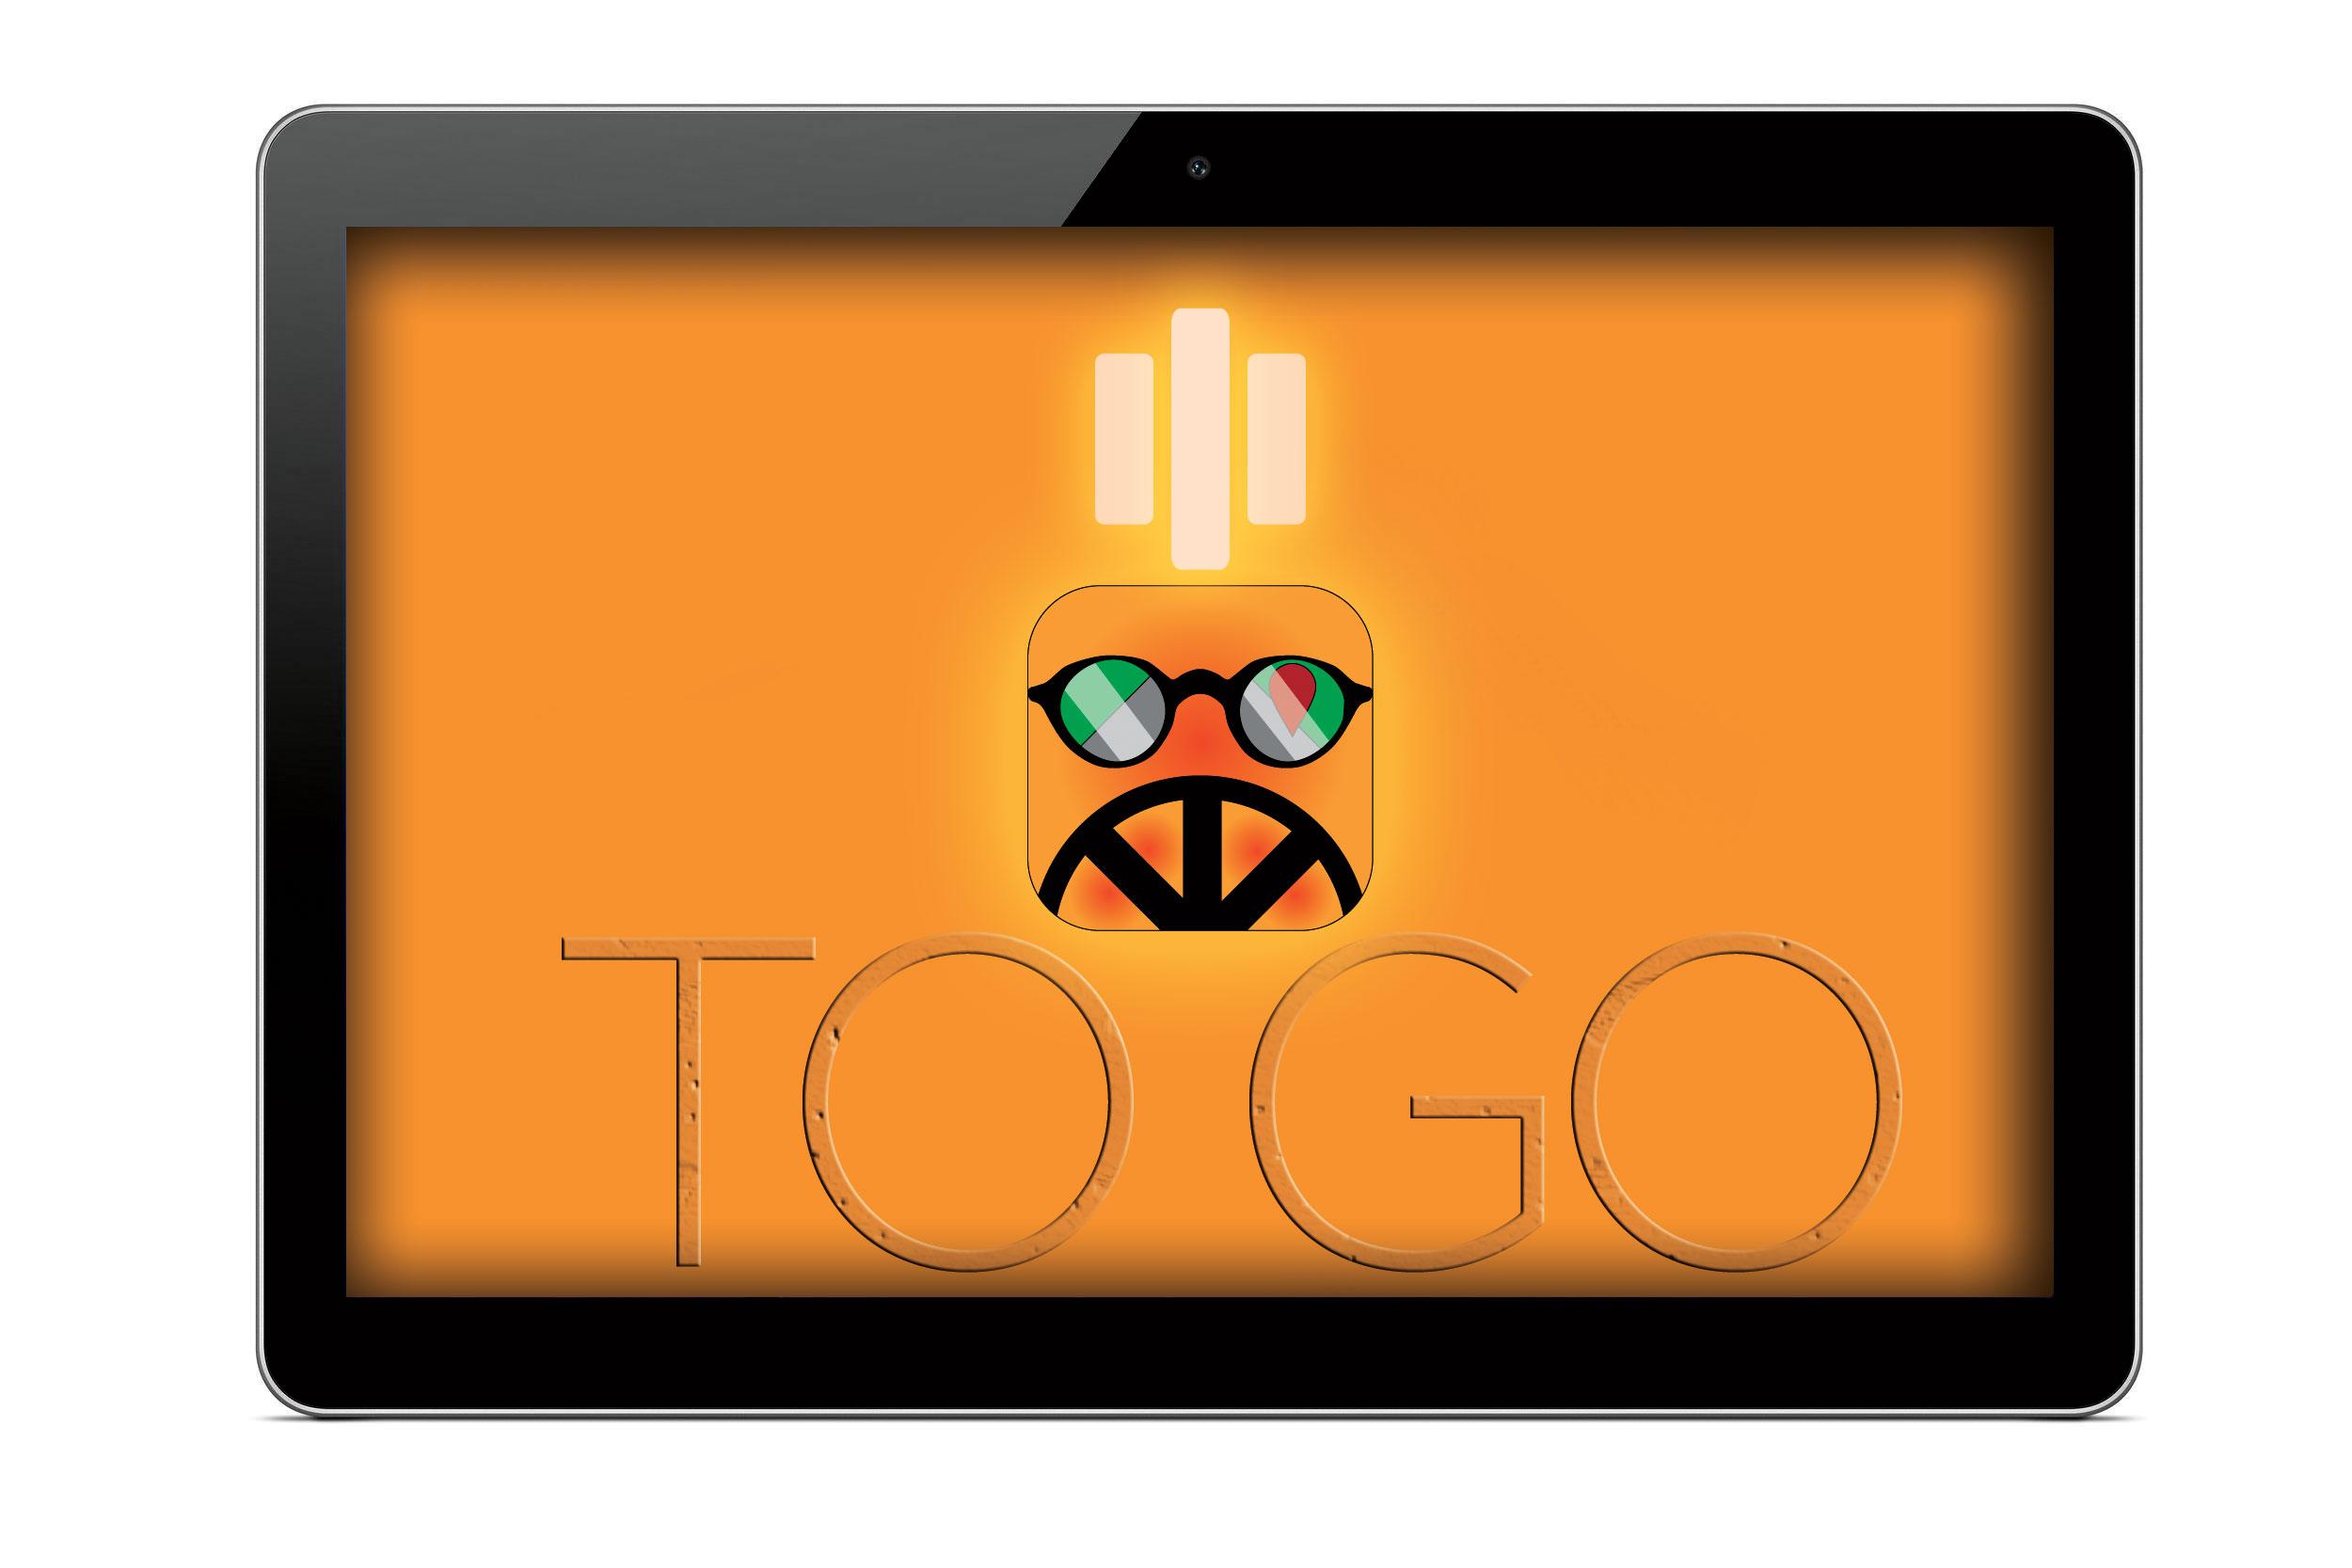 Разработать логотип и экран загрузки приложения фото f_4765a9d70260f85b.jpg